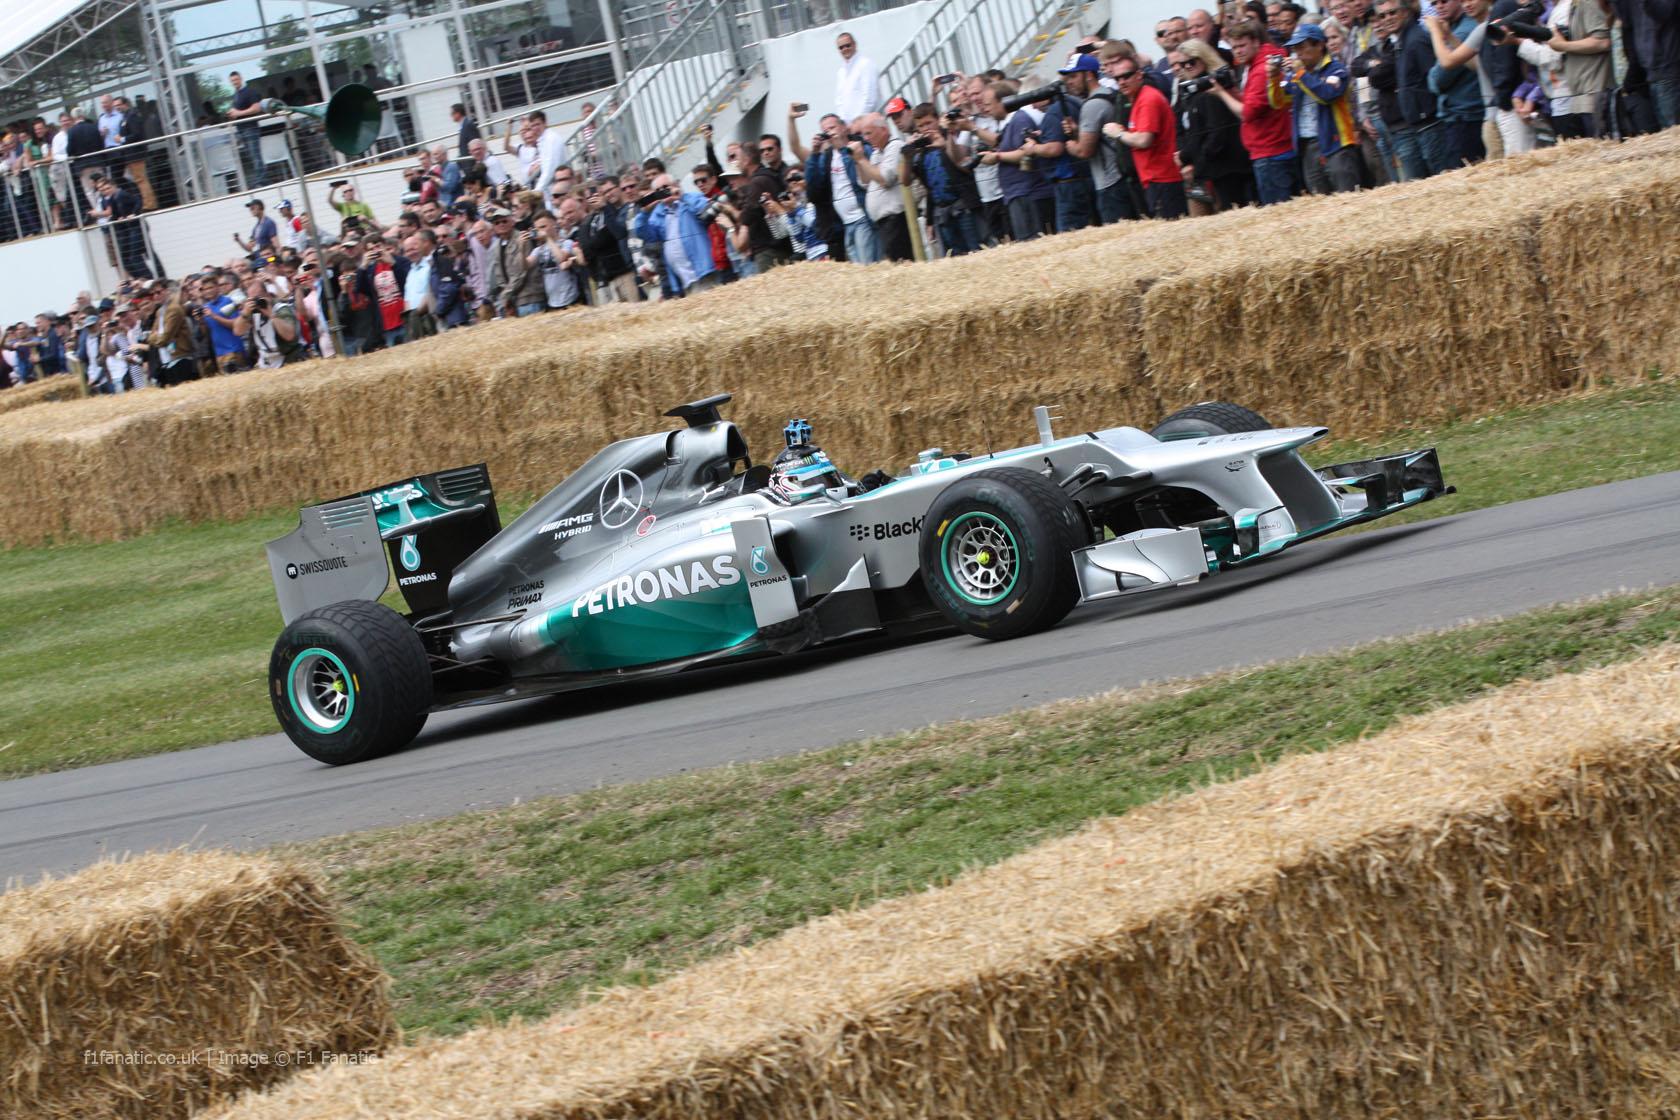 Mercedes W03 (3), Goodwood Festival of Speed, 2014